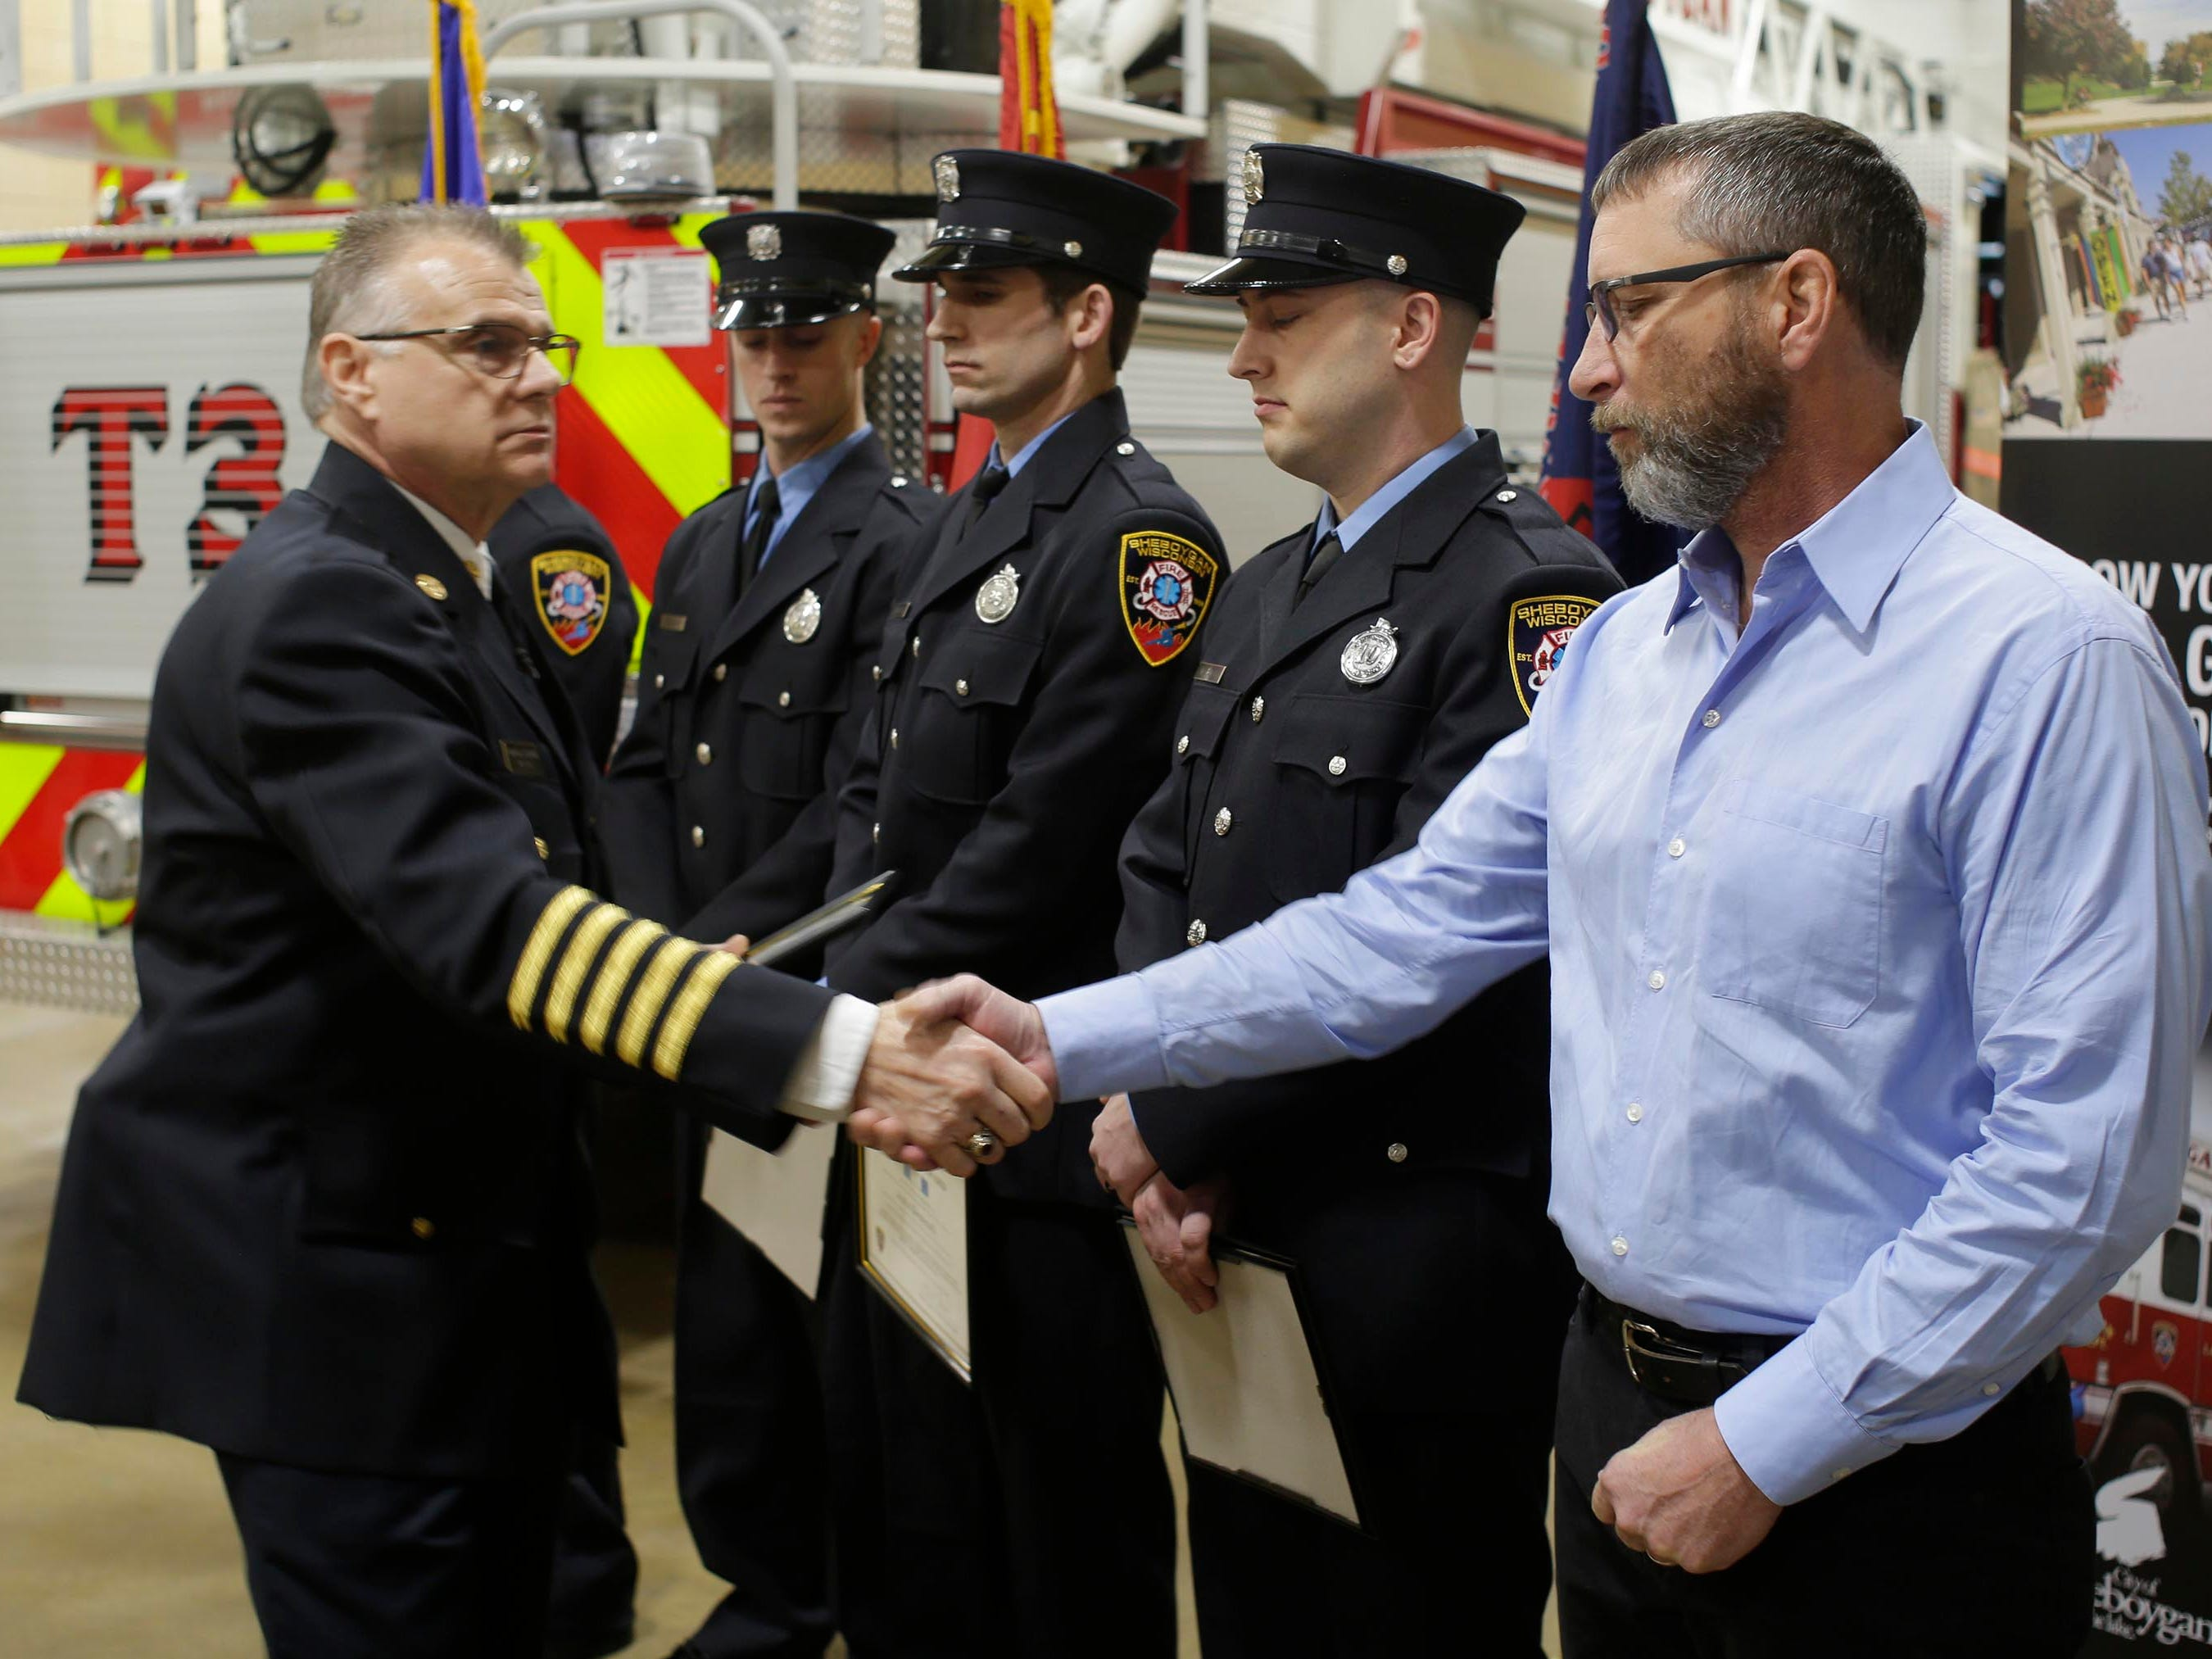 Sheboygan Fire Chief Mike Romas shakes the hand of retired firefighter Kurt Spatt, Wednesday, February 21, 2019, in Sheboygan, Wis.